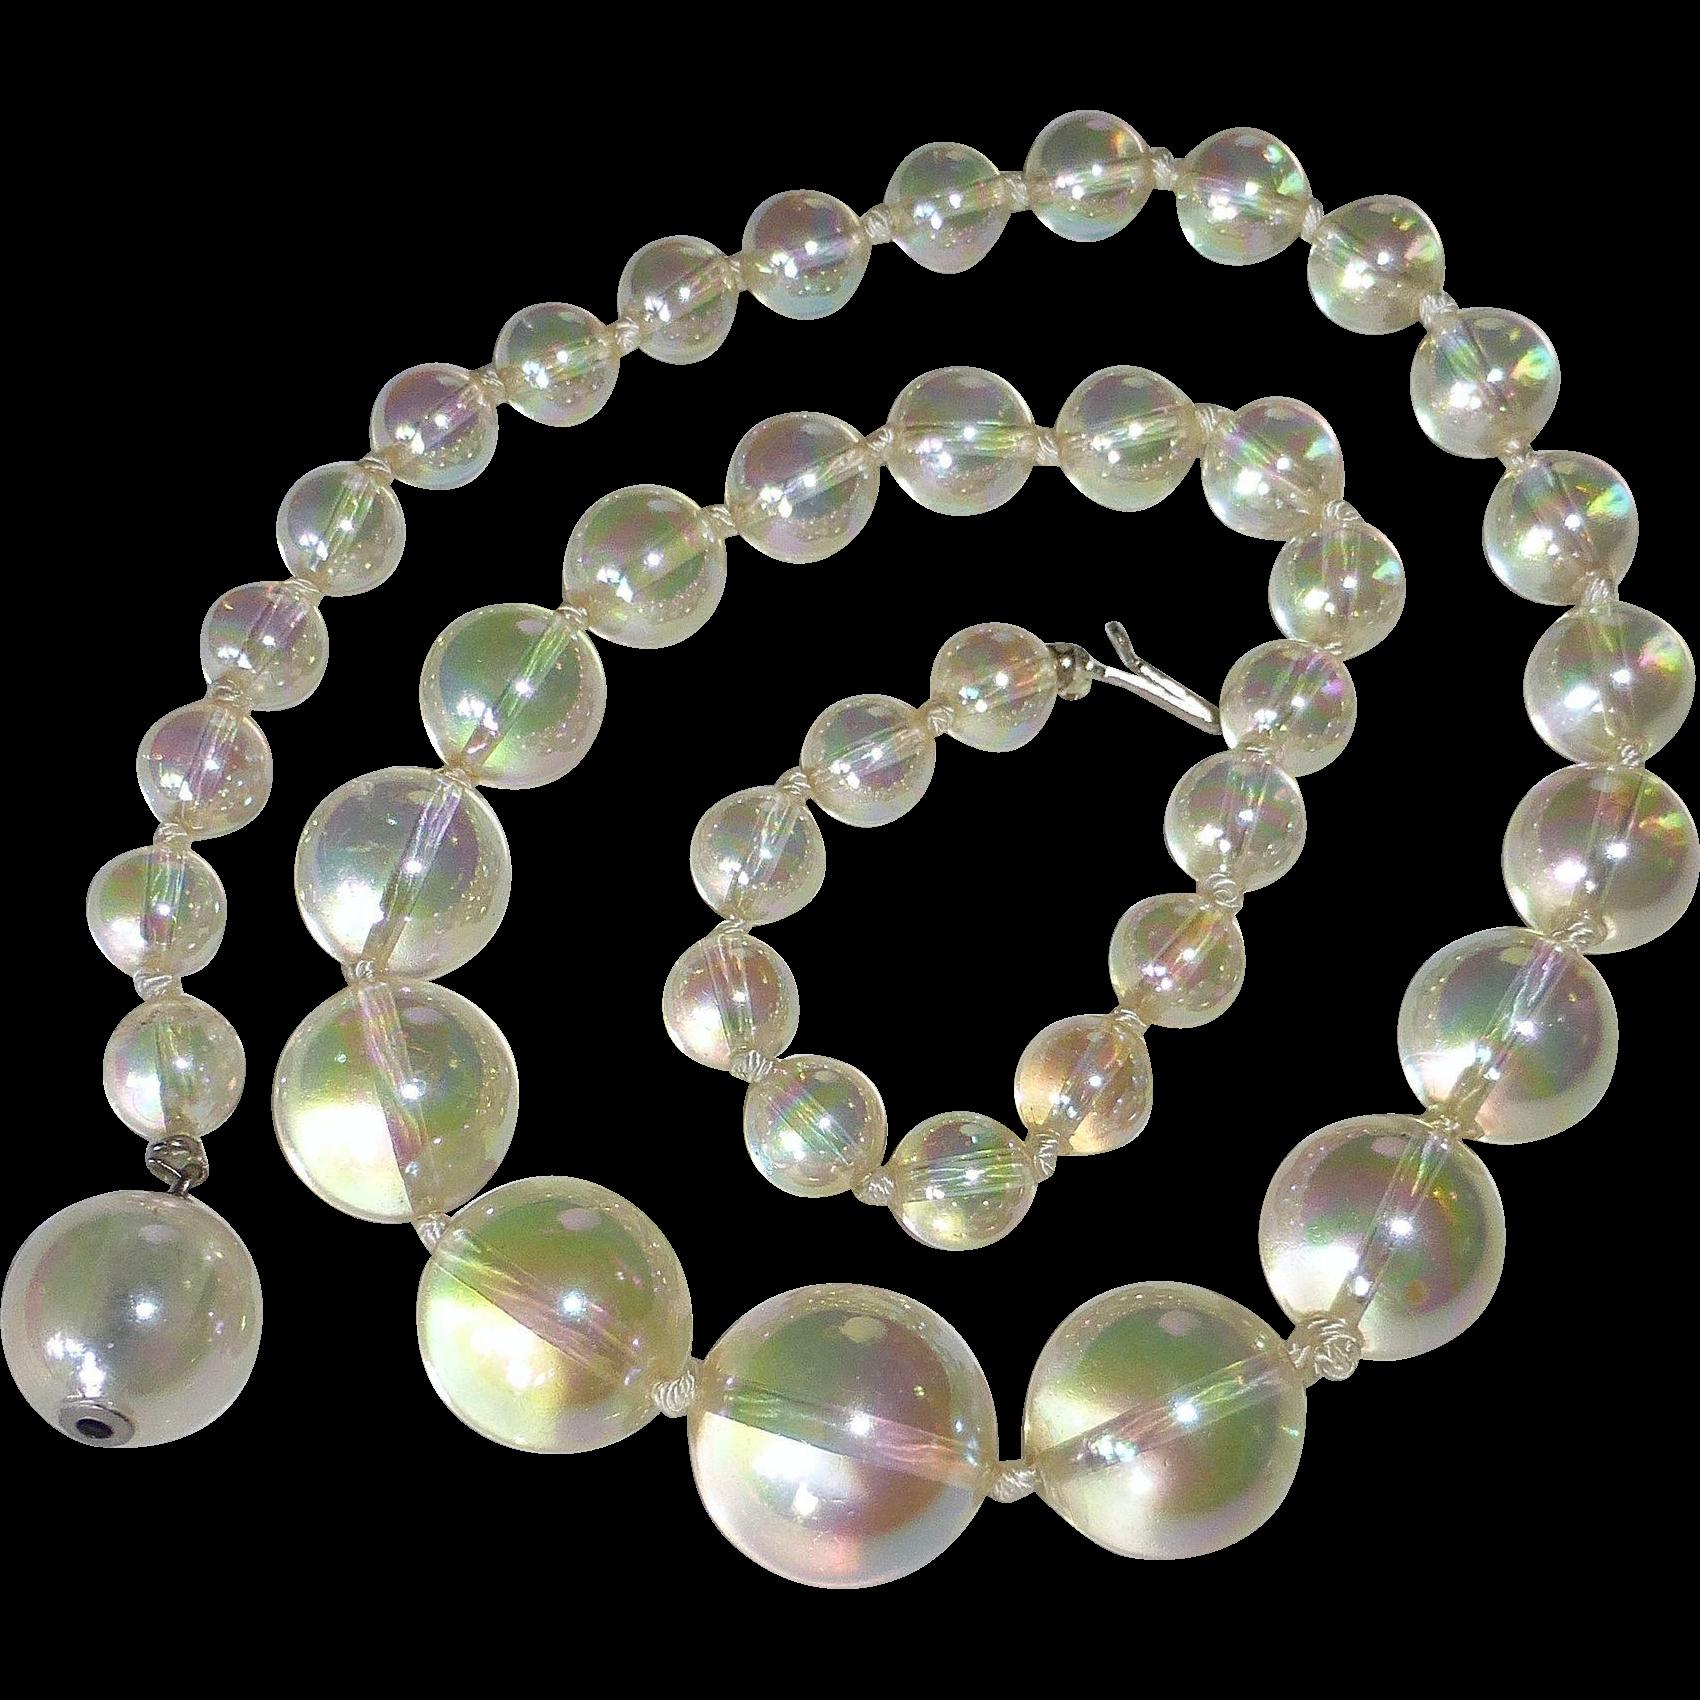 Iridescent Soap Bubbles Graduated Bead Necklace